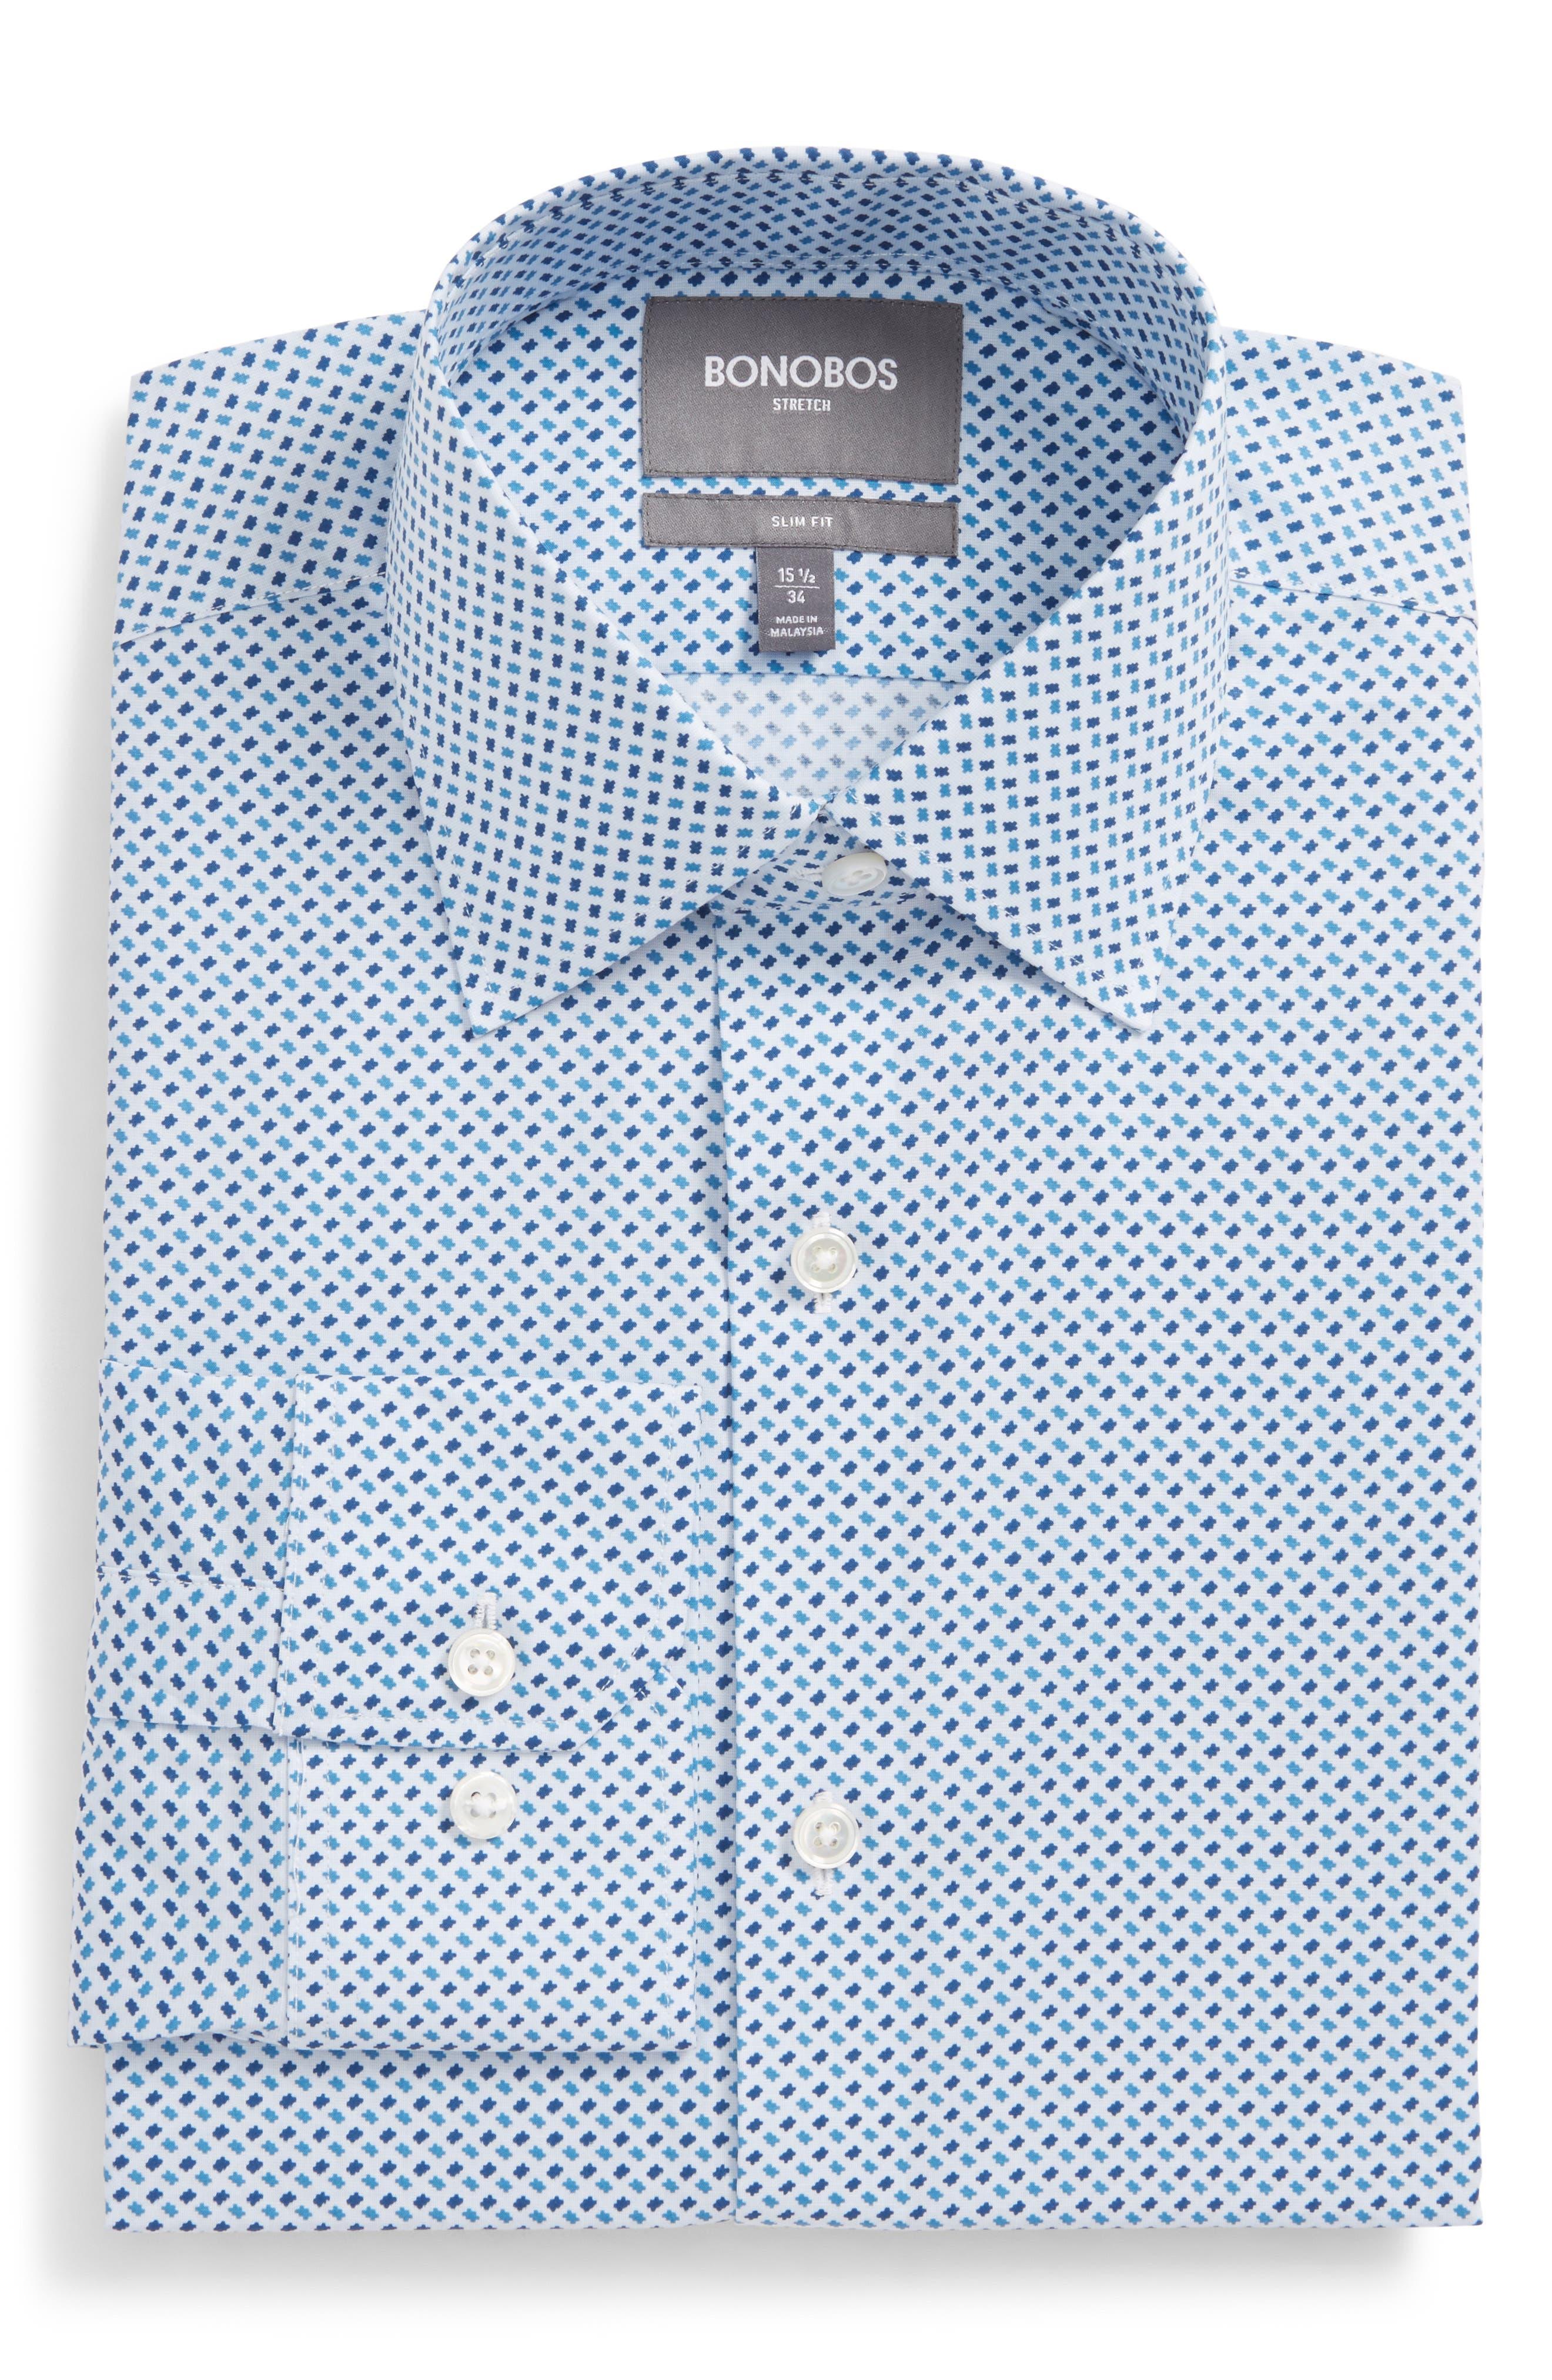 BONOBOS Easton Slim Fit Geometric Print Dress Shirt, Main, color, 400